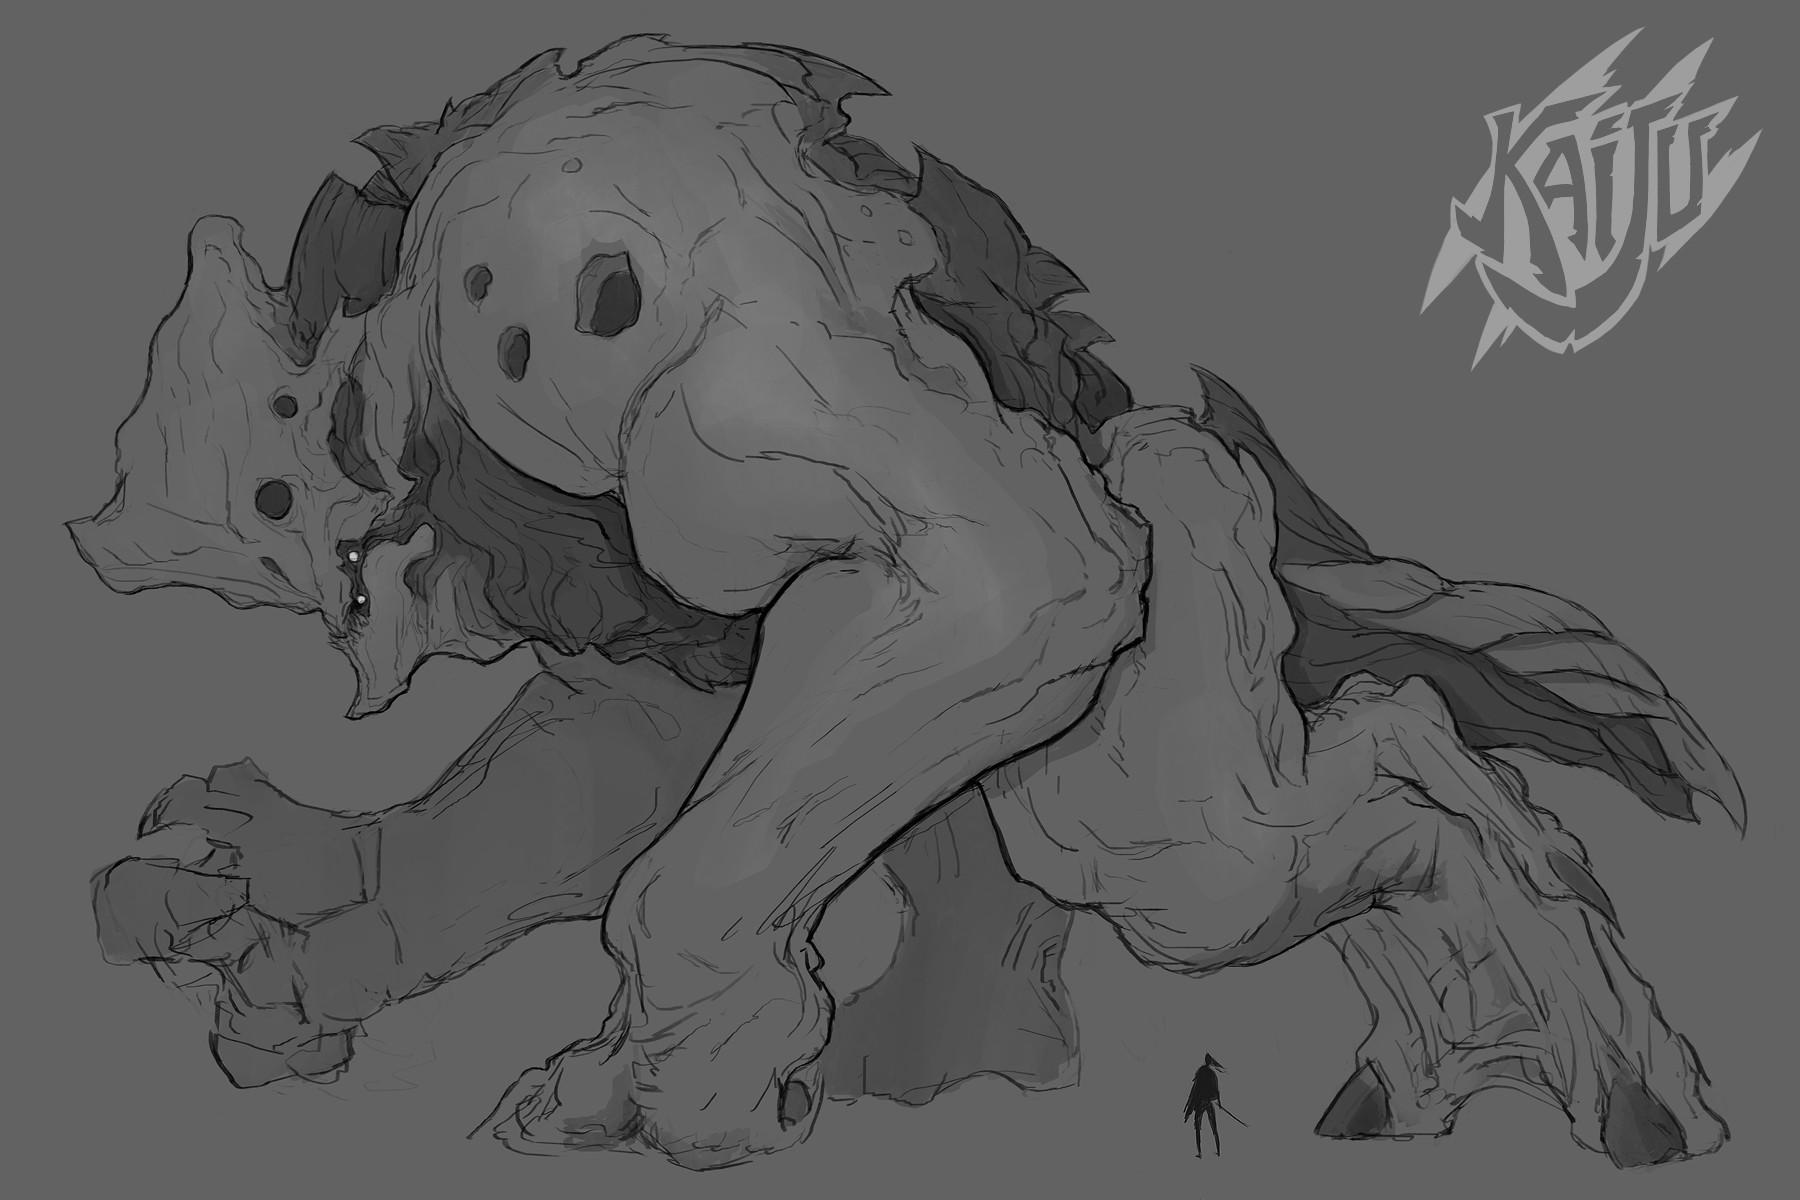 Alexandre chaudret kaijus creature predator13